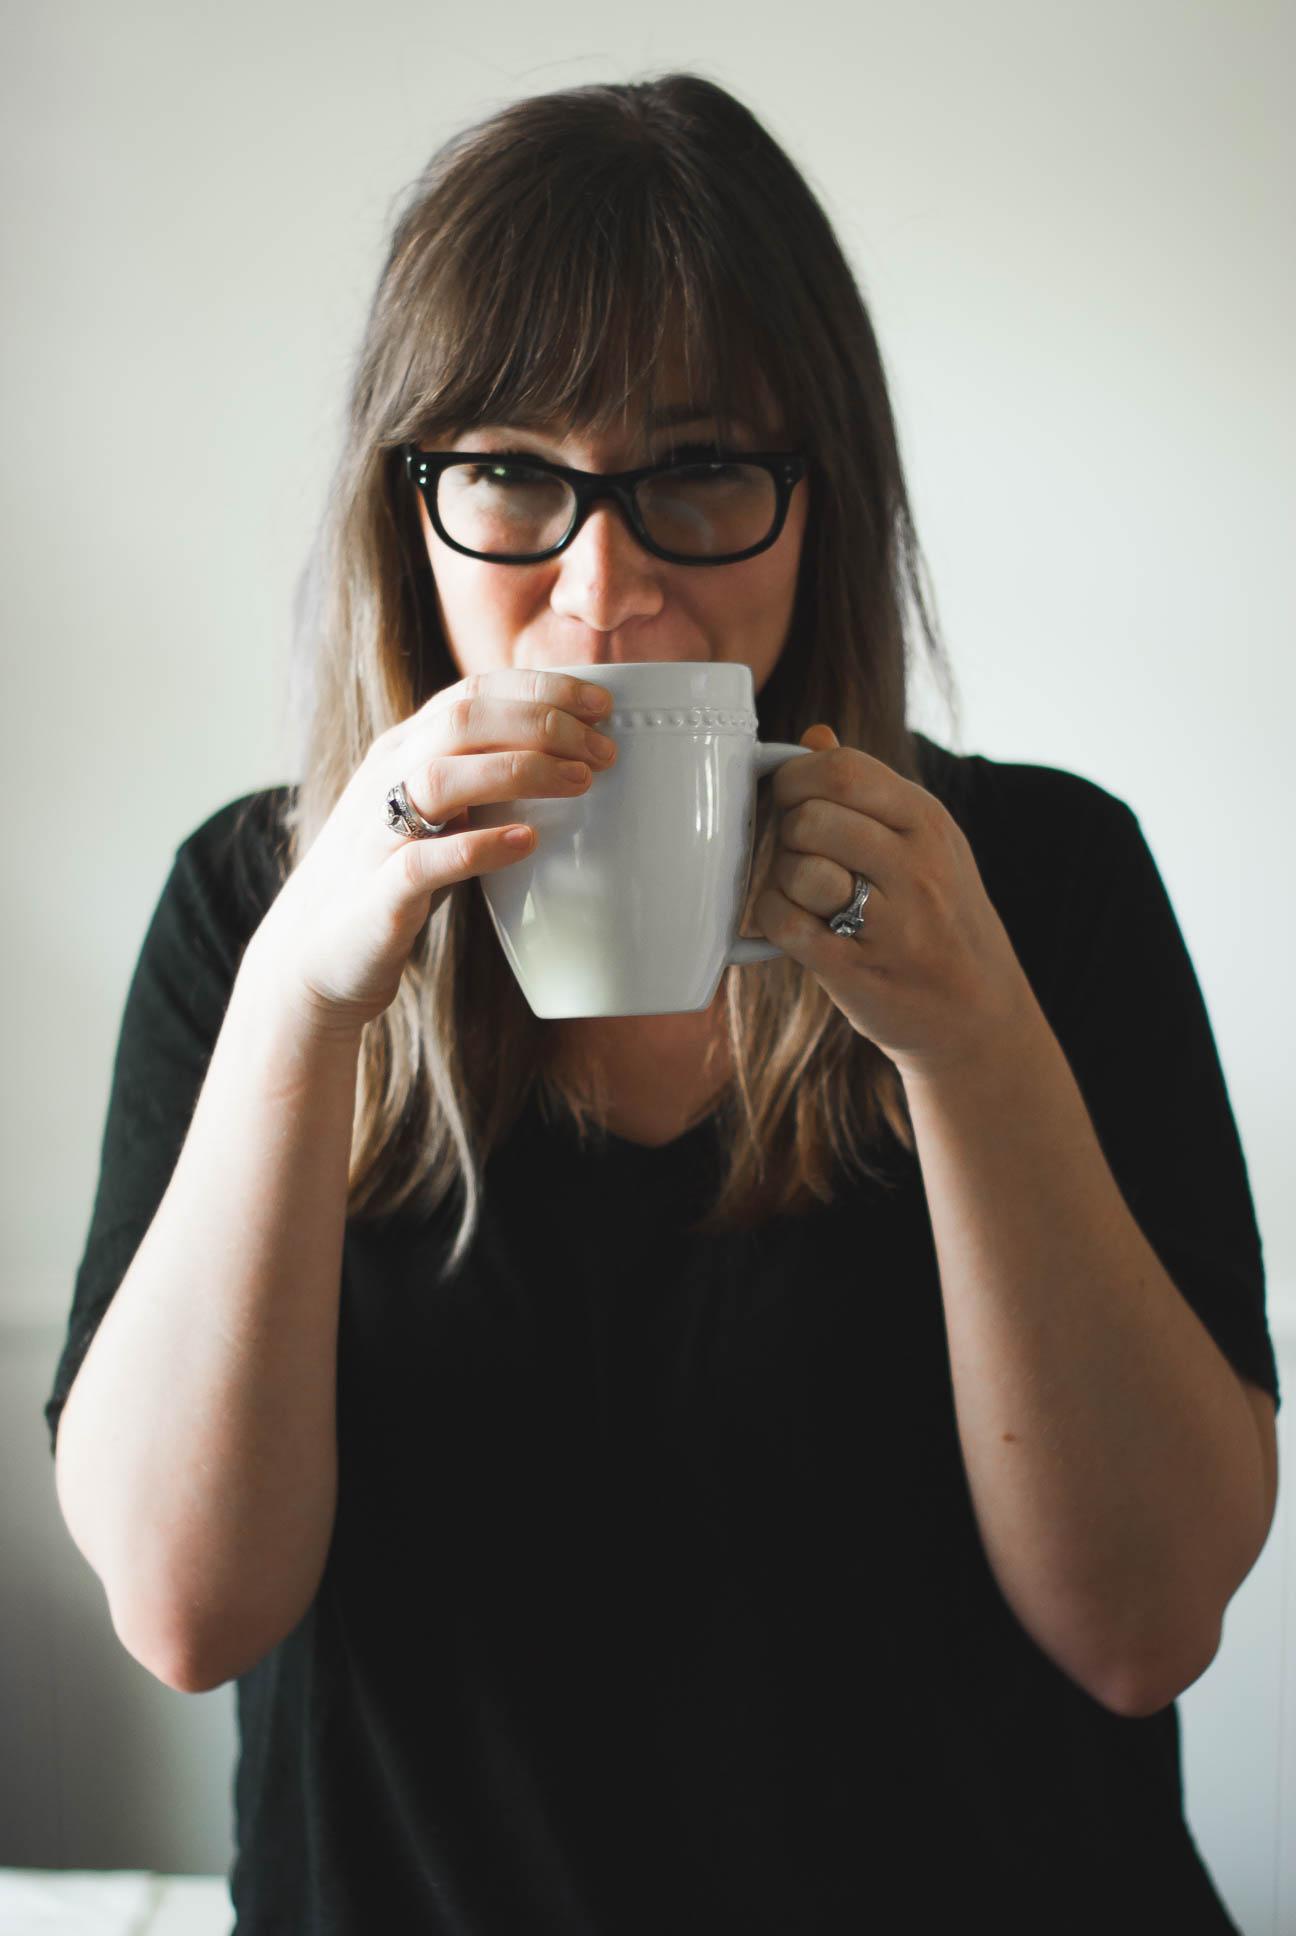 Karin Rambo of truncationblog.com shares why her Sacrifices Don't Really Matter